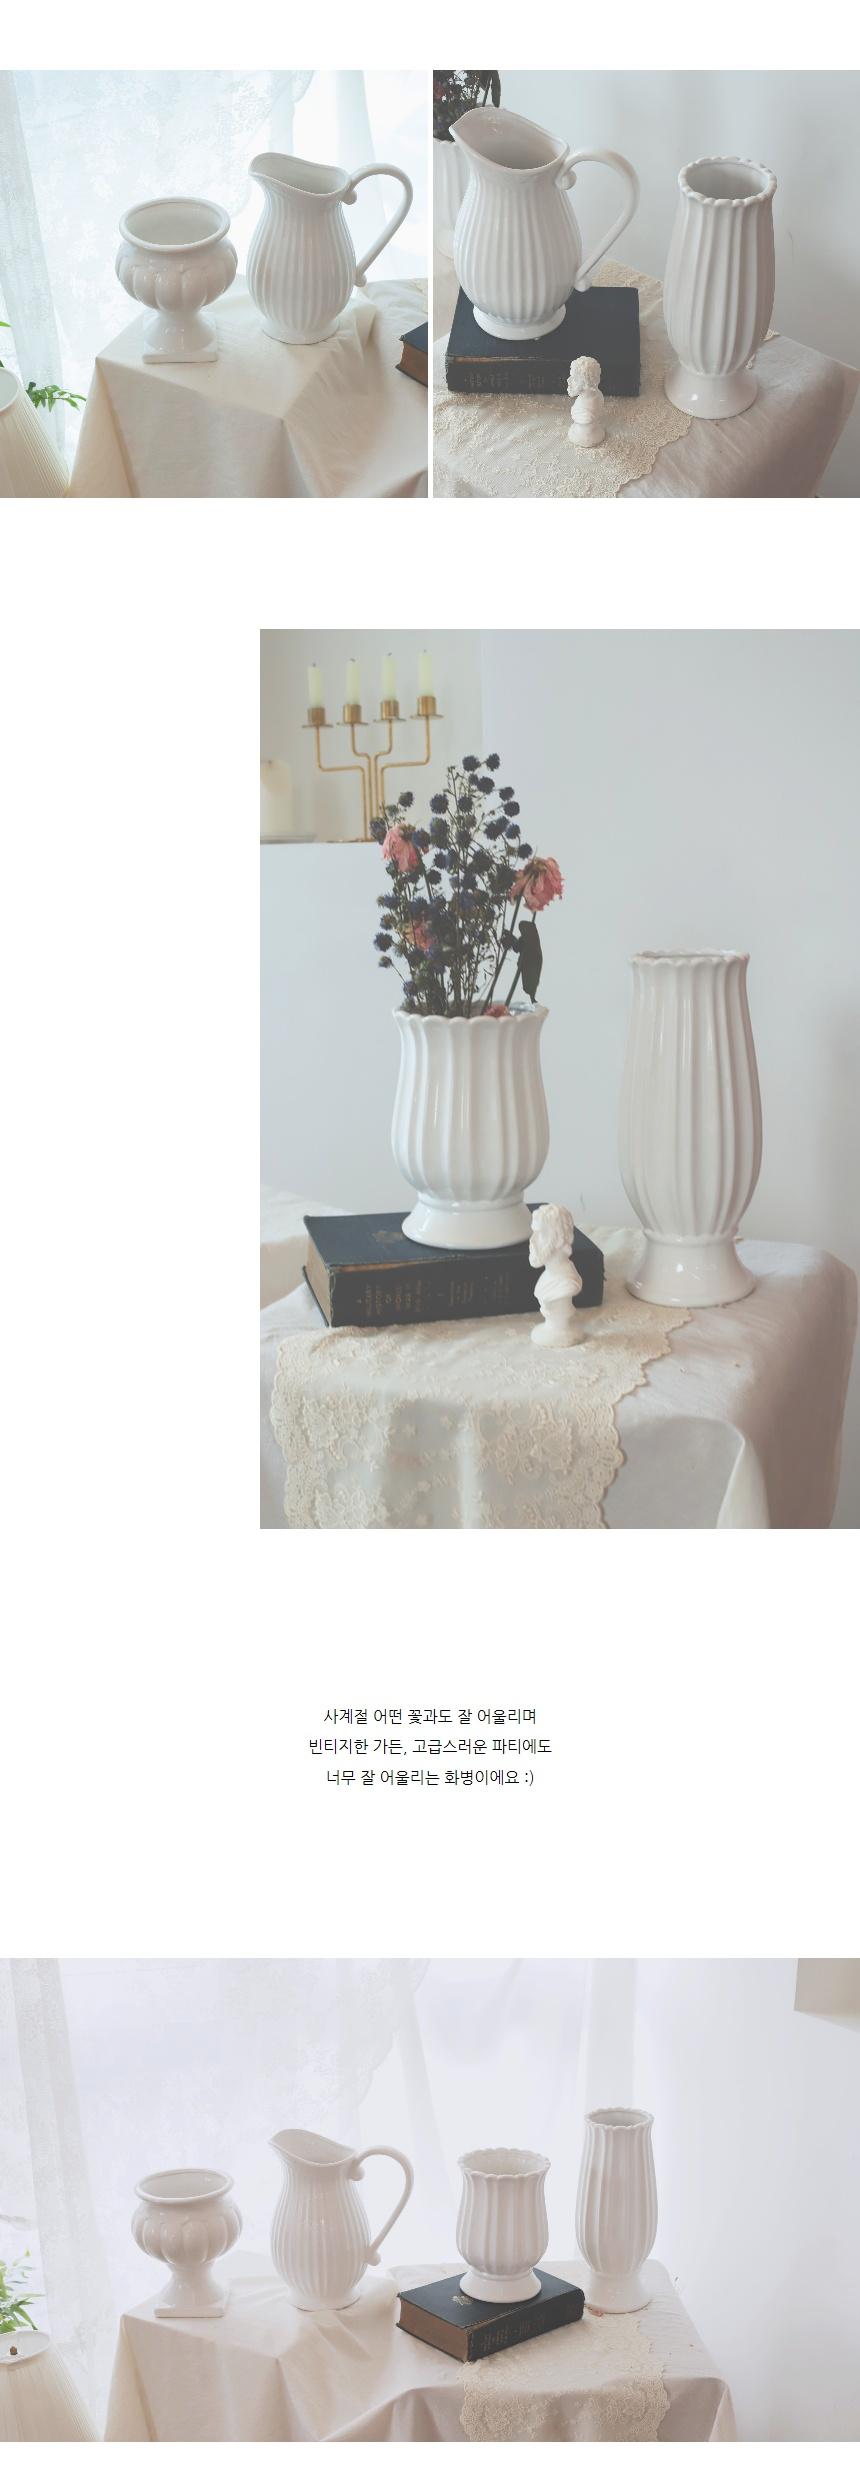 nordic_antique_pottery_vase_02.jpg